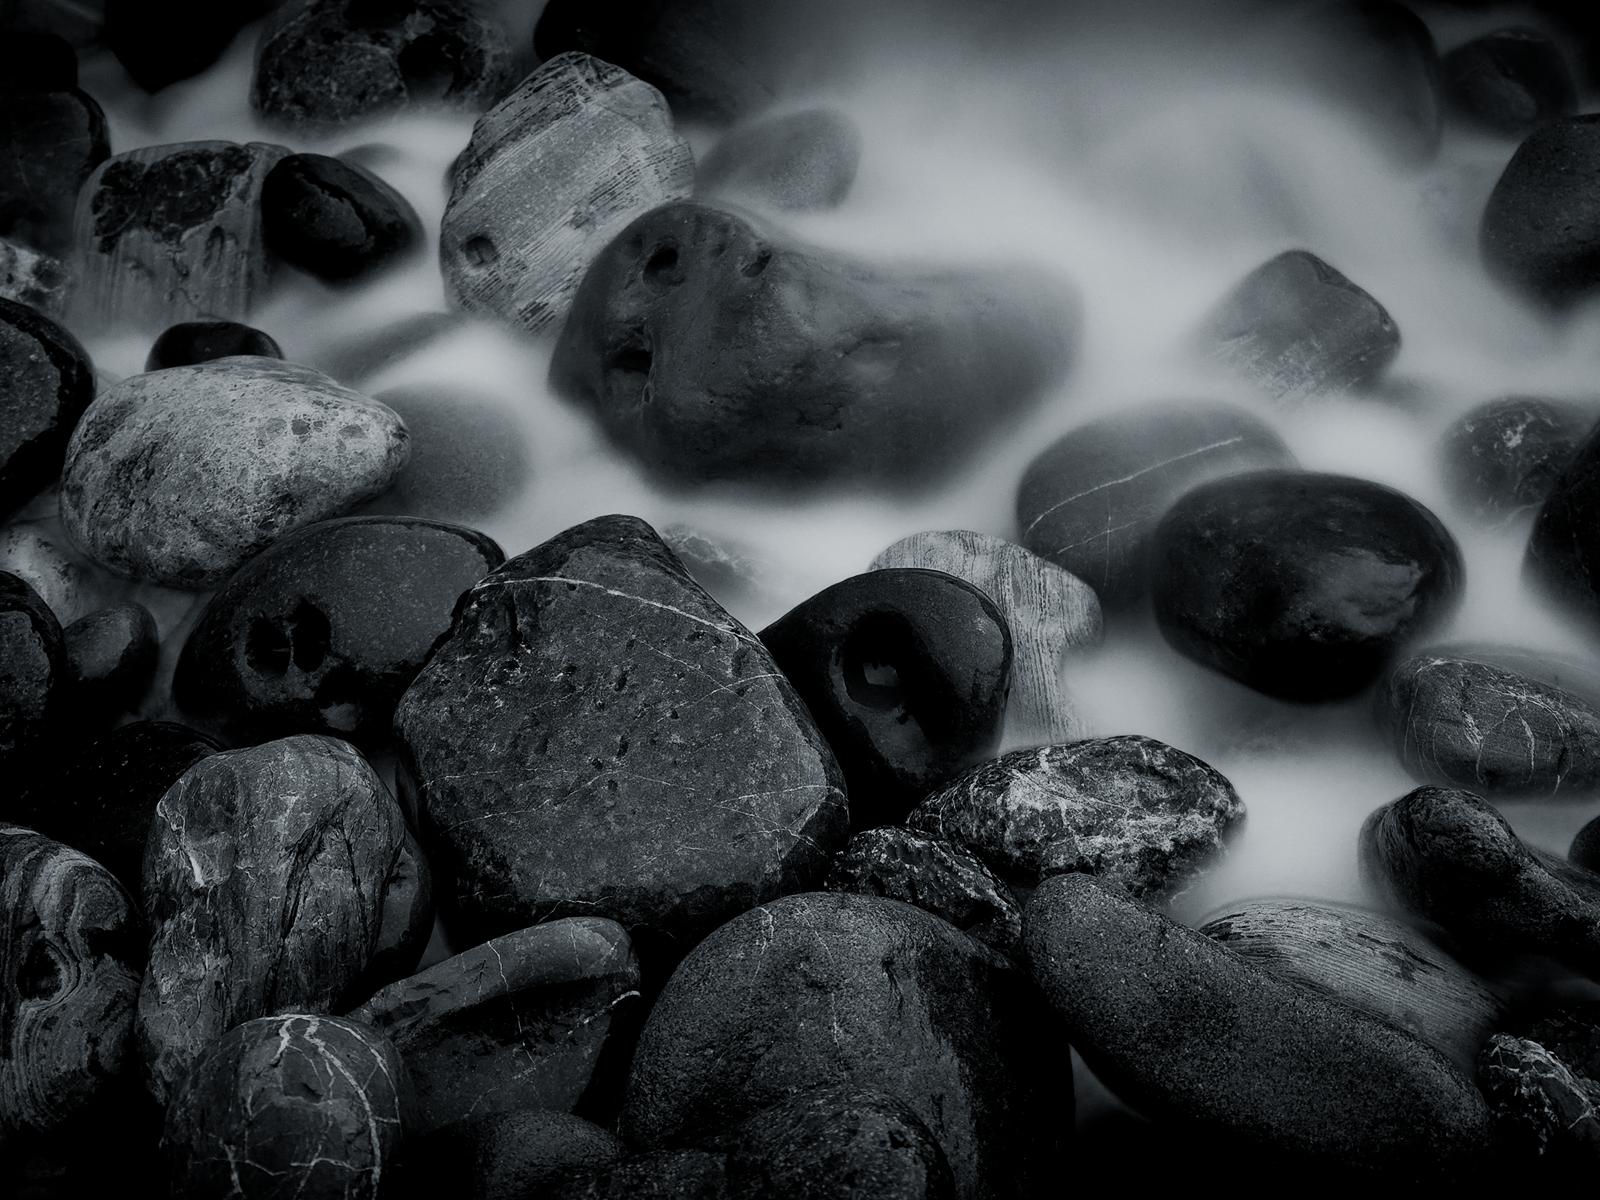 Black and White River Rocks wallpaper I hope we shall crush in 1600x1200